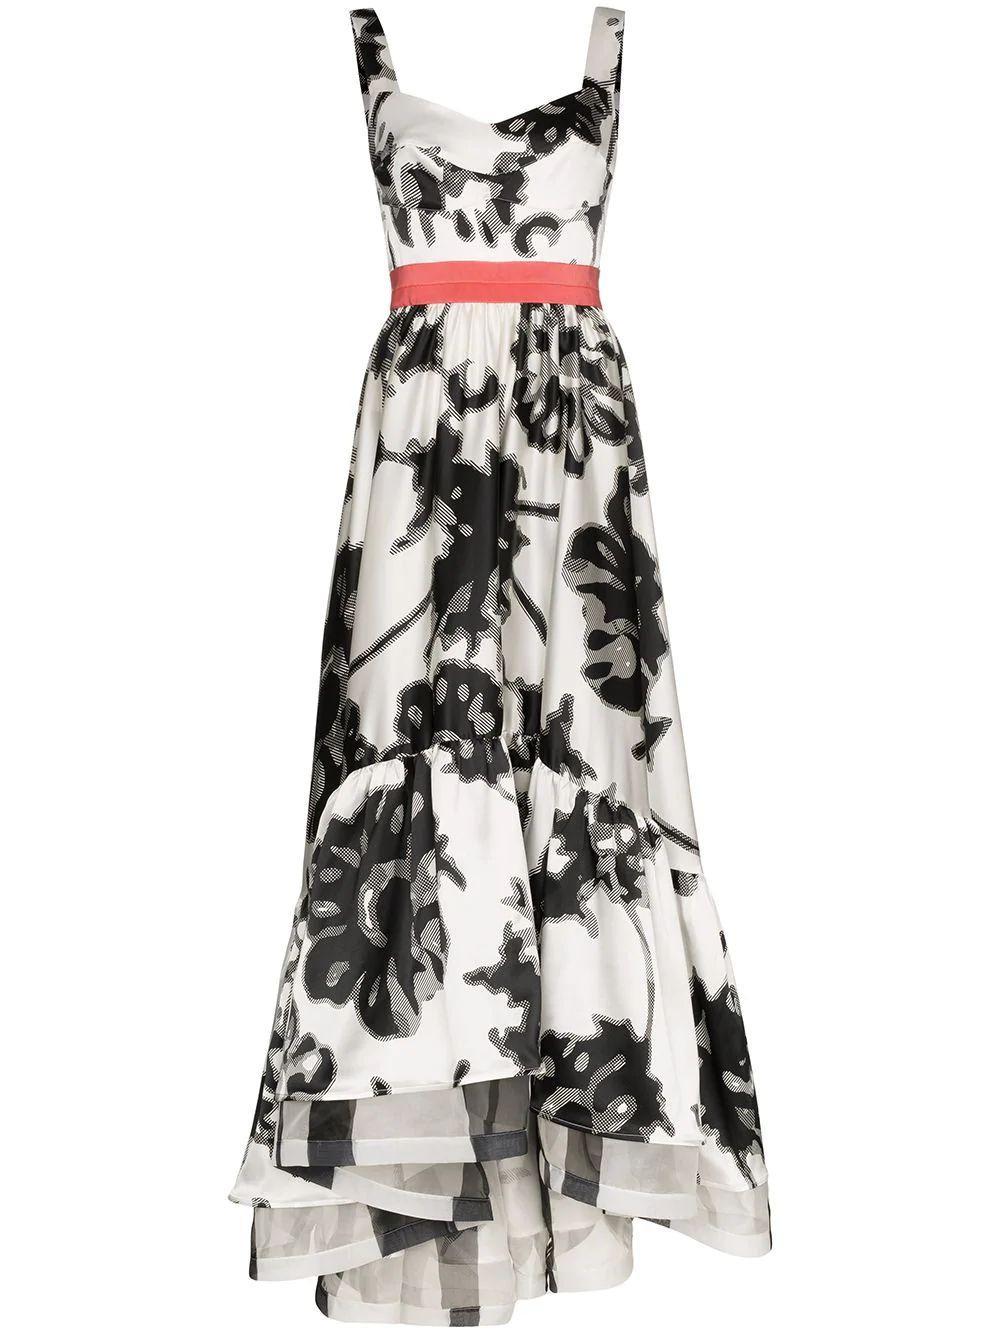 Floral Printed High Low Dress